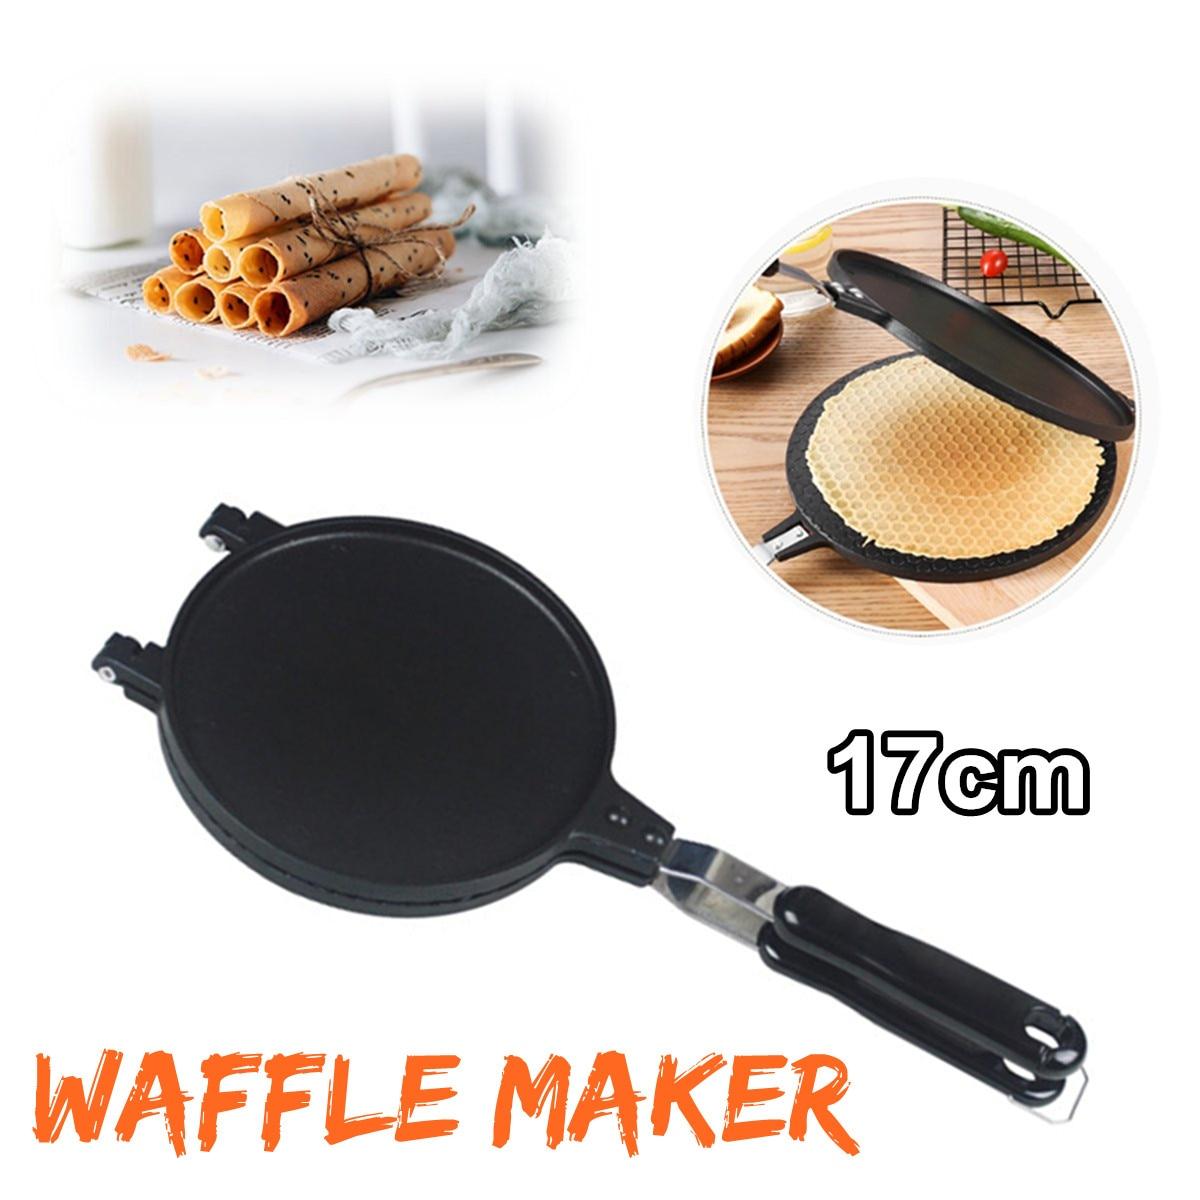 Aluminum Alloy Household Waffle Bake Maker Kitchen Non-Stick Waffle Maker Pan Mould Mold Press Plate Waffle Iron Baking Tools